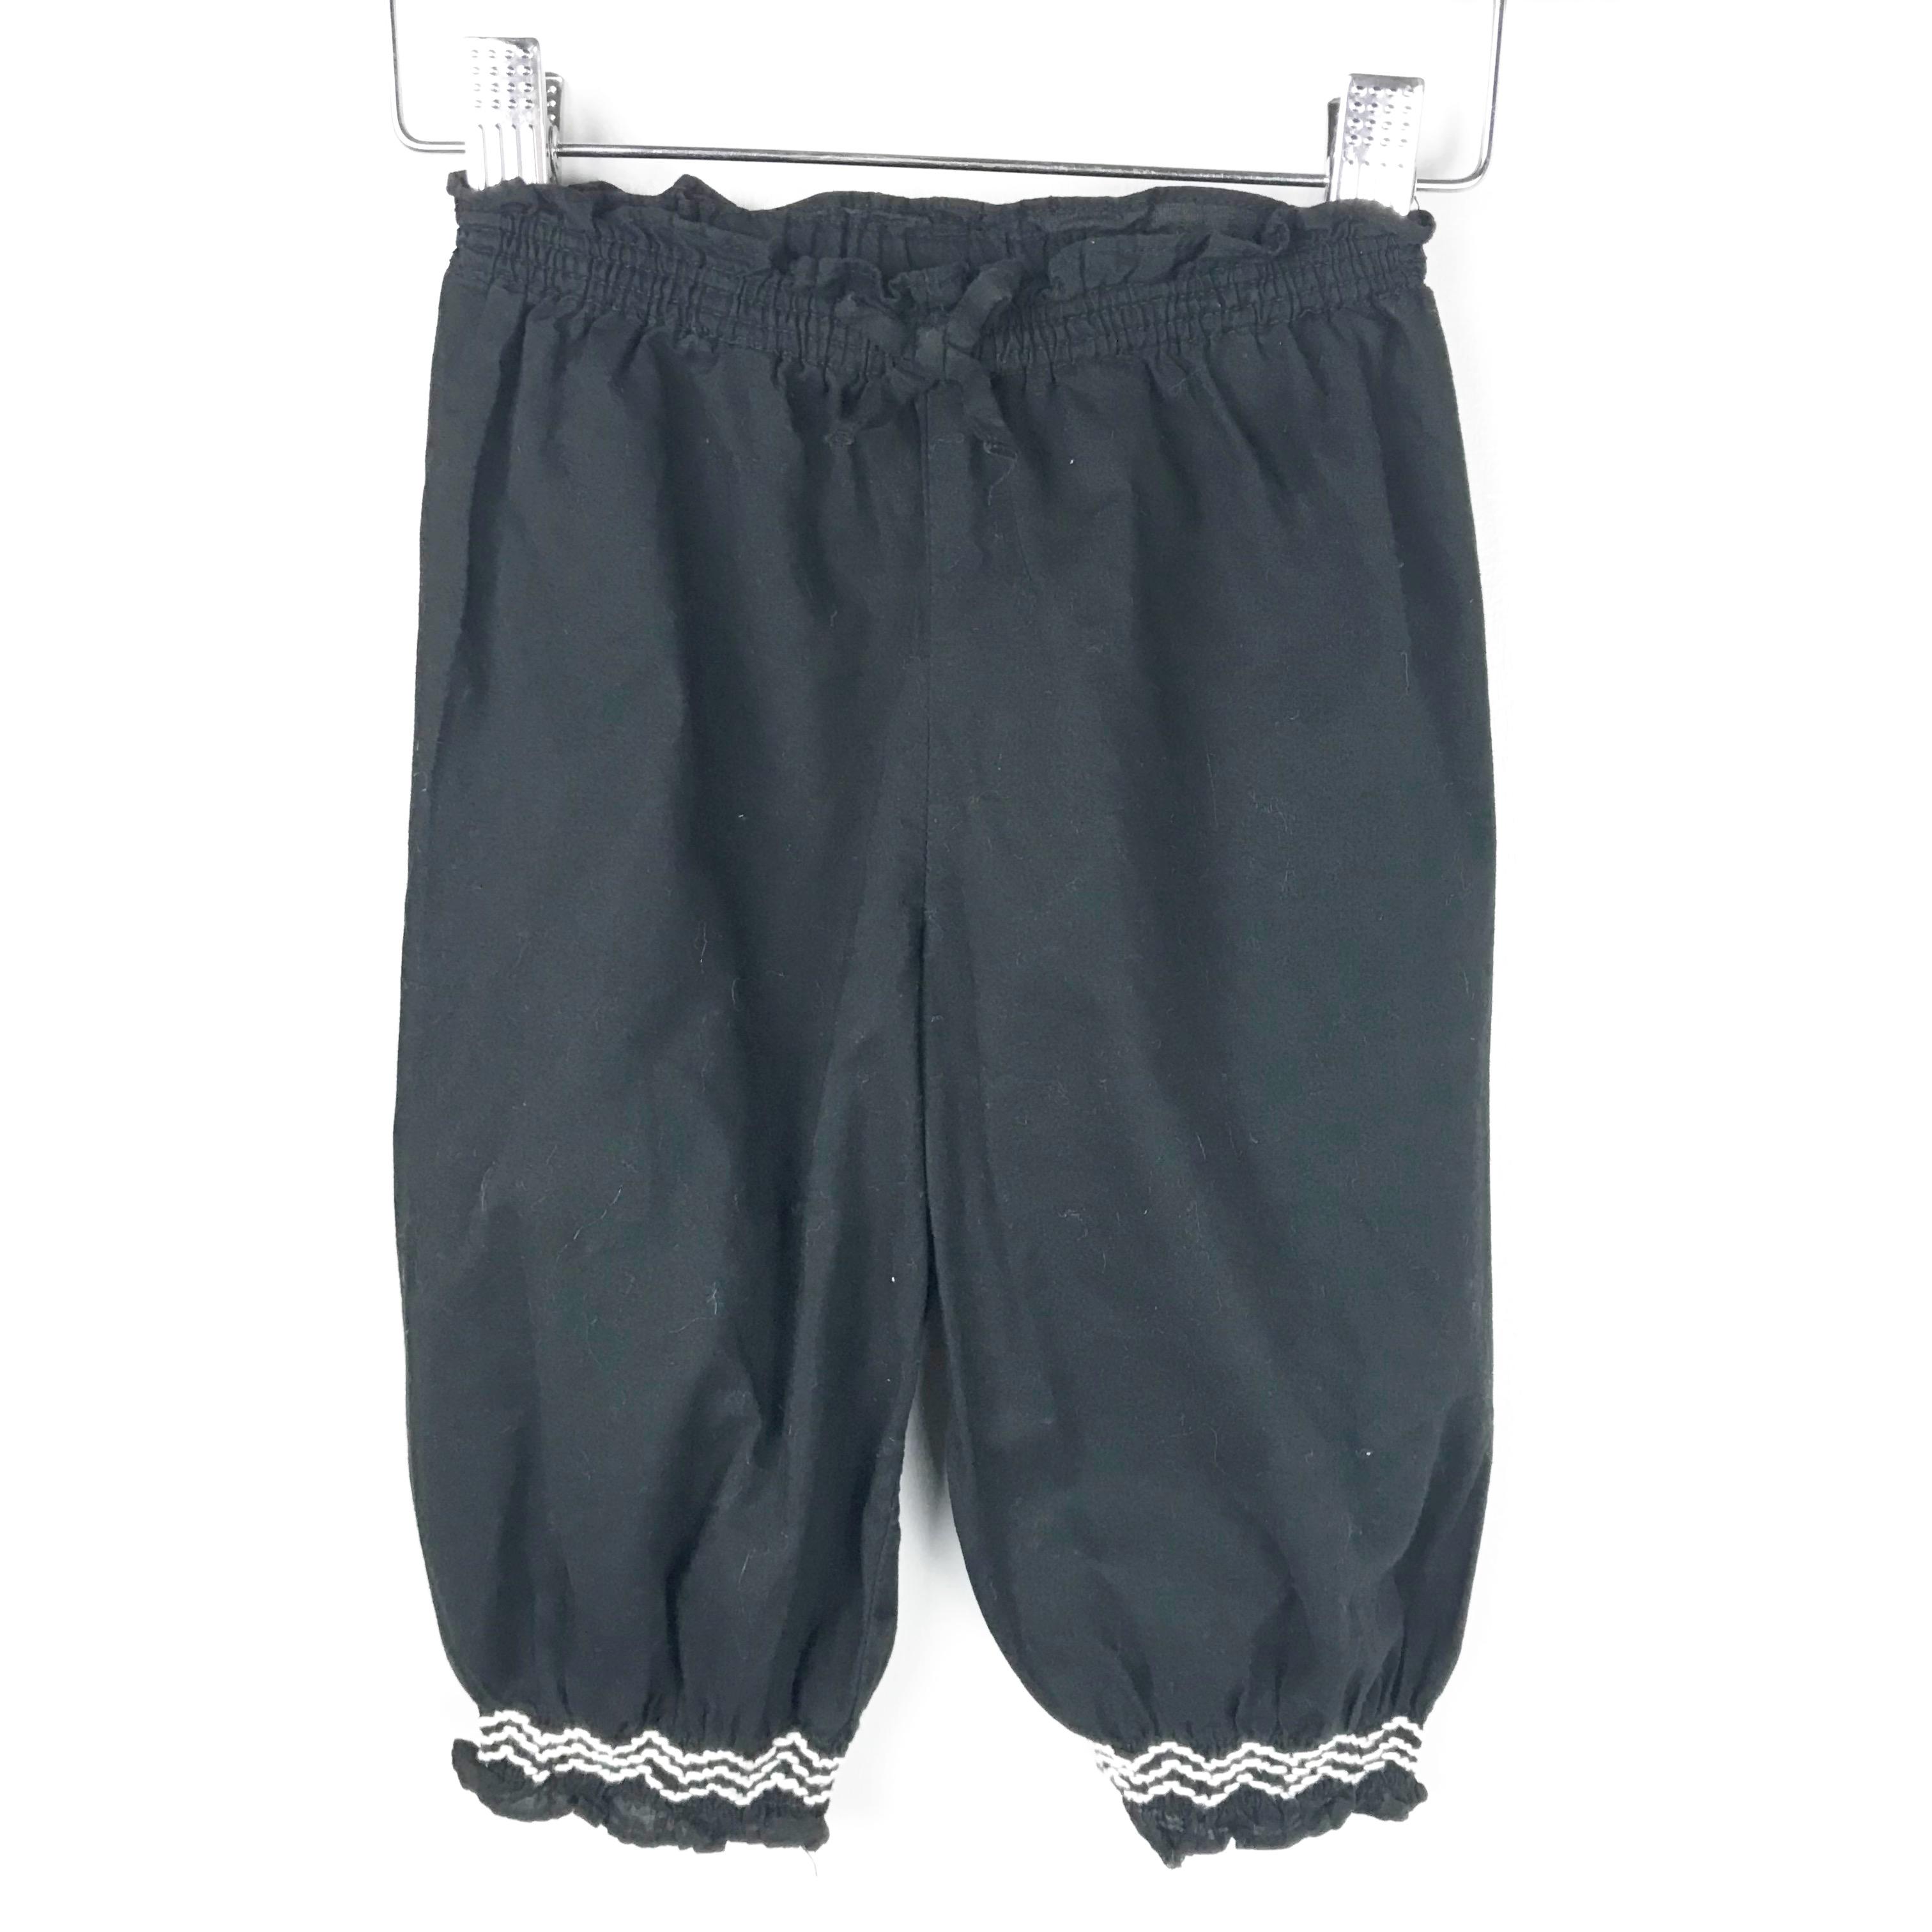 Gap Baby  6-12M Pants, Jeans and Leggings